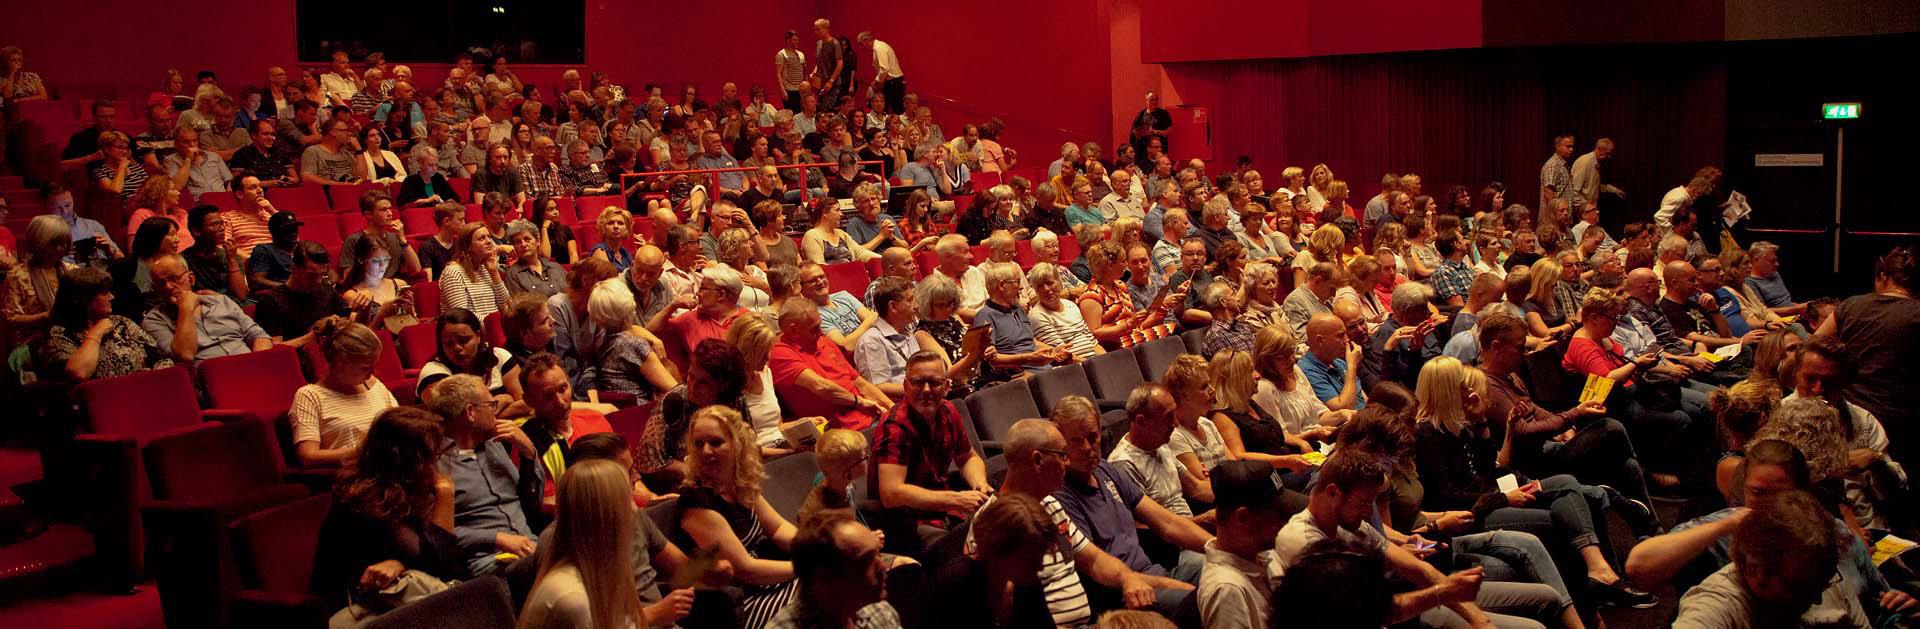 Theaters en Podia  Regio Achterhoek - Liemers